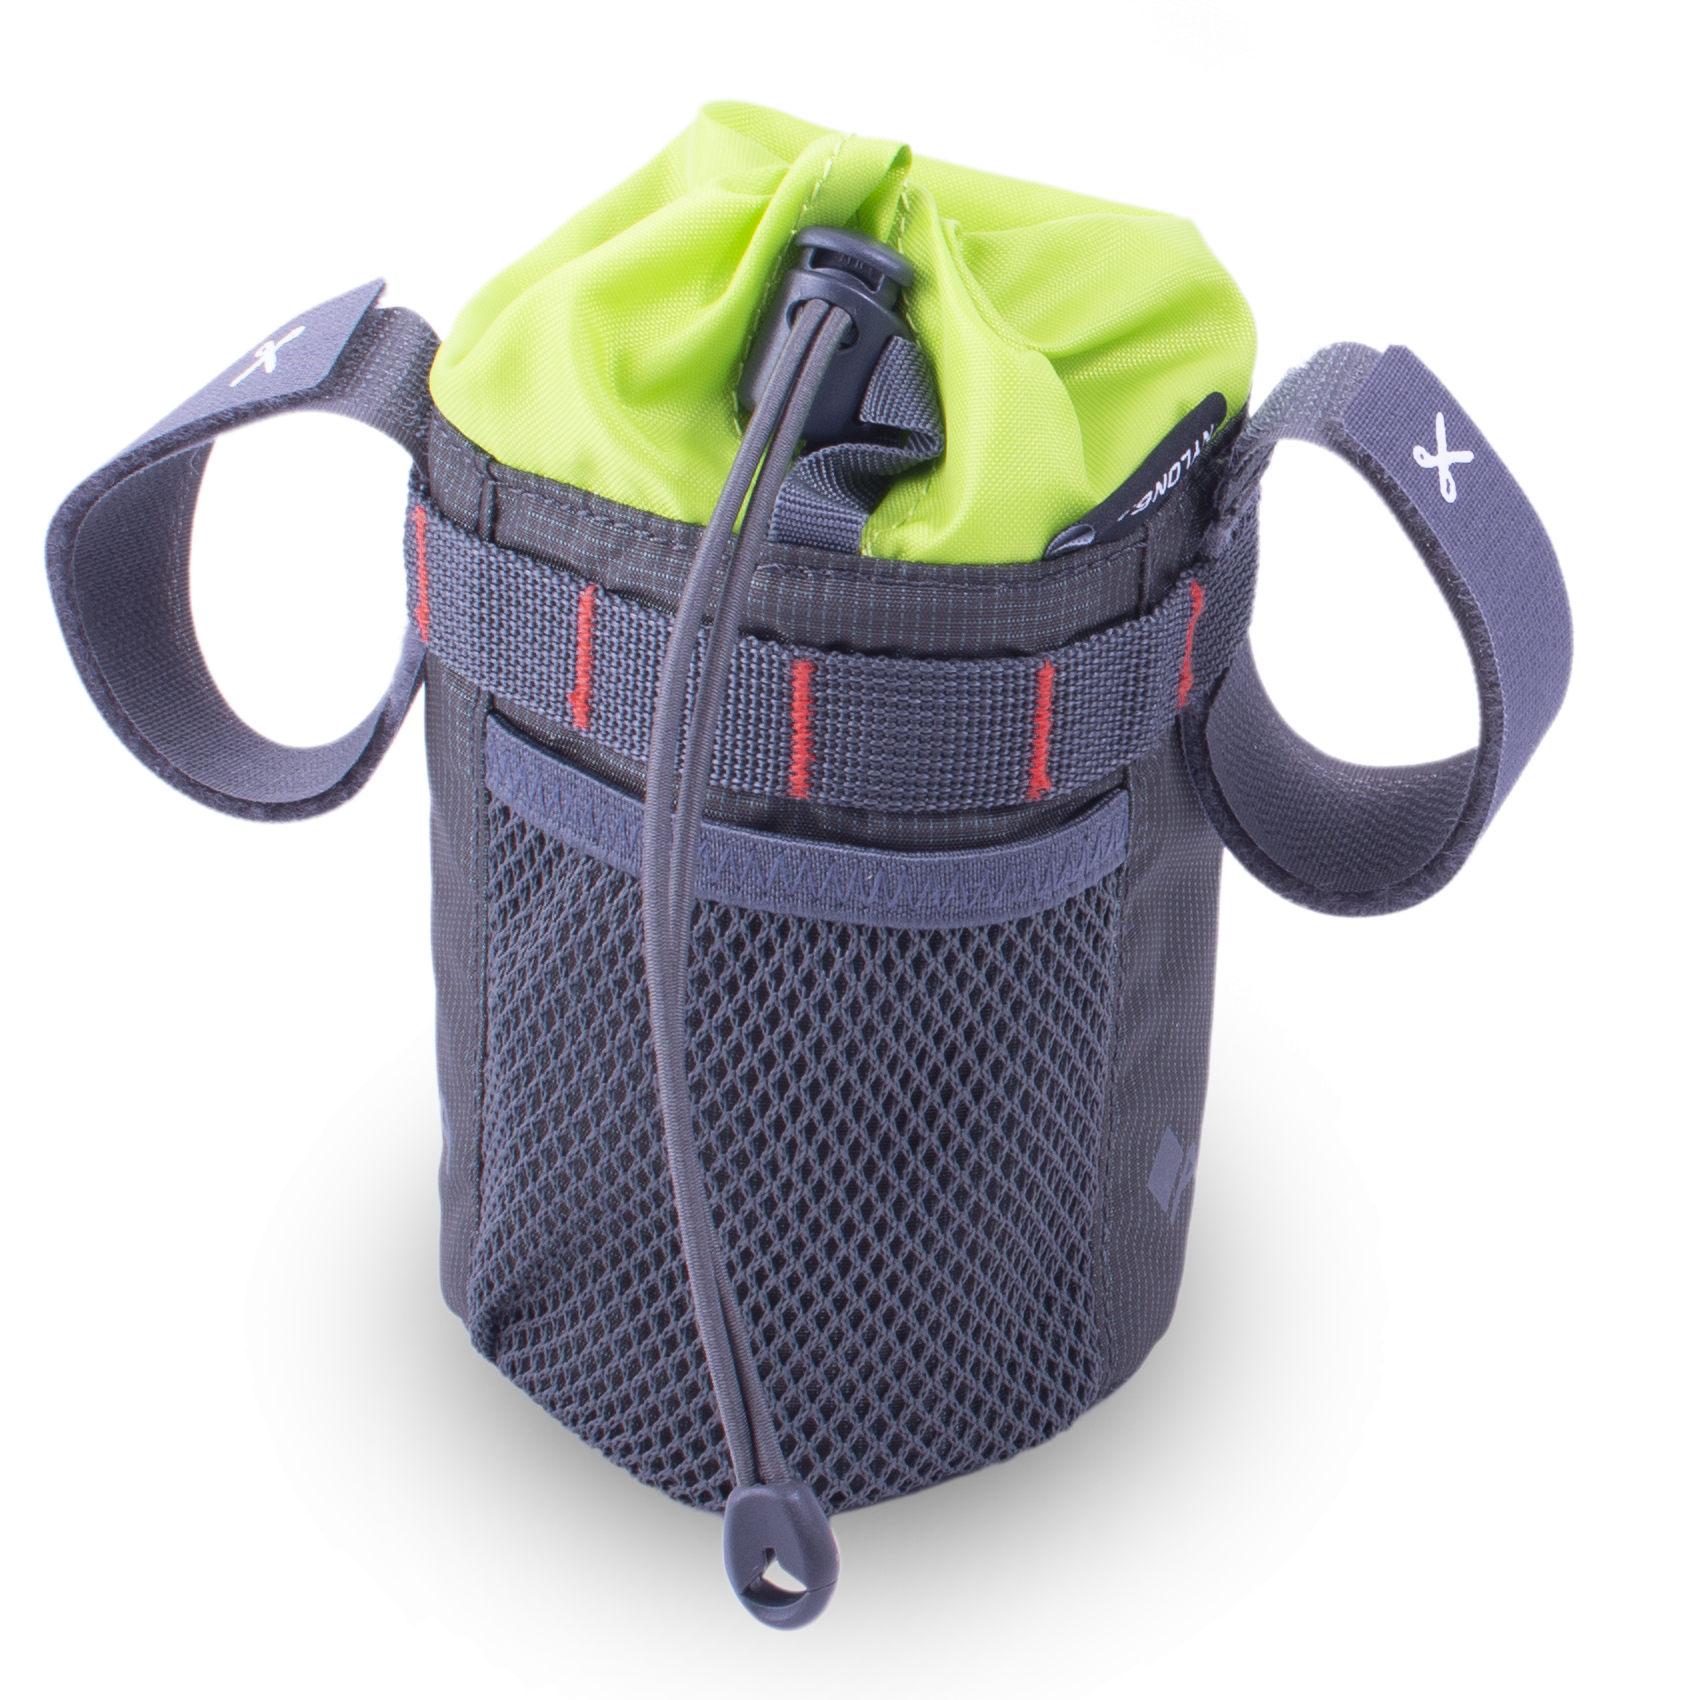 Acepac Bike Bottle Bag - grey